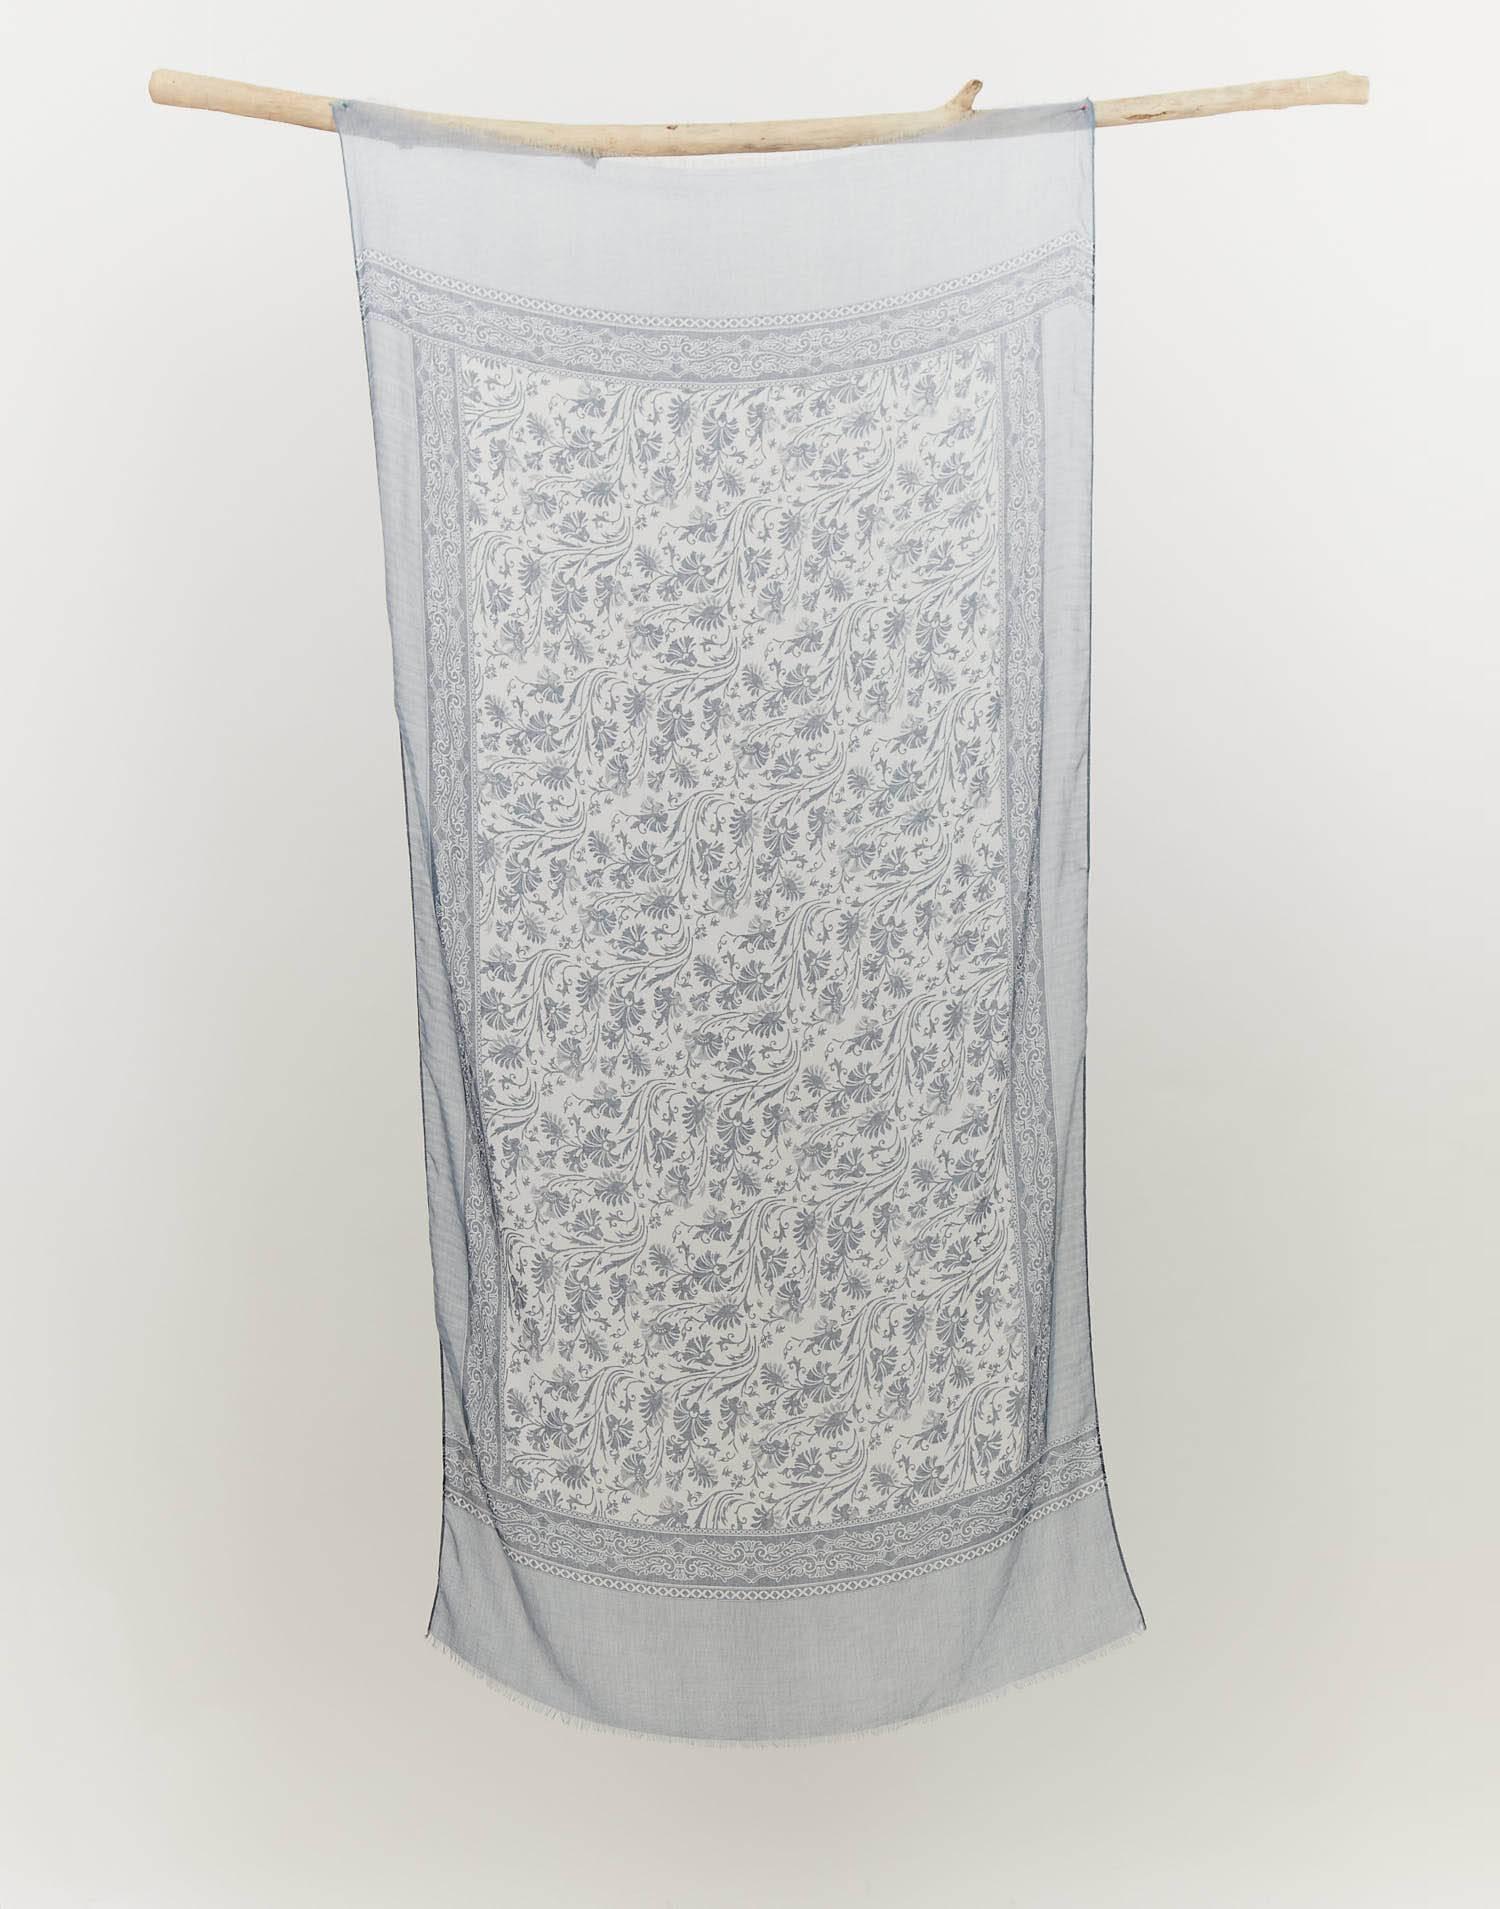 Fular bicolor print floral cenefa